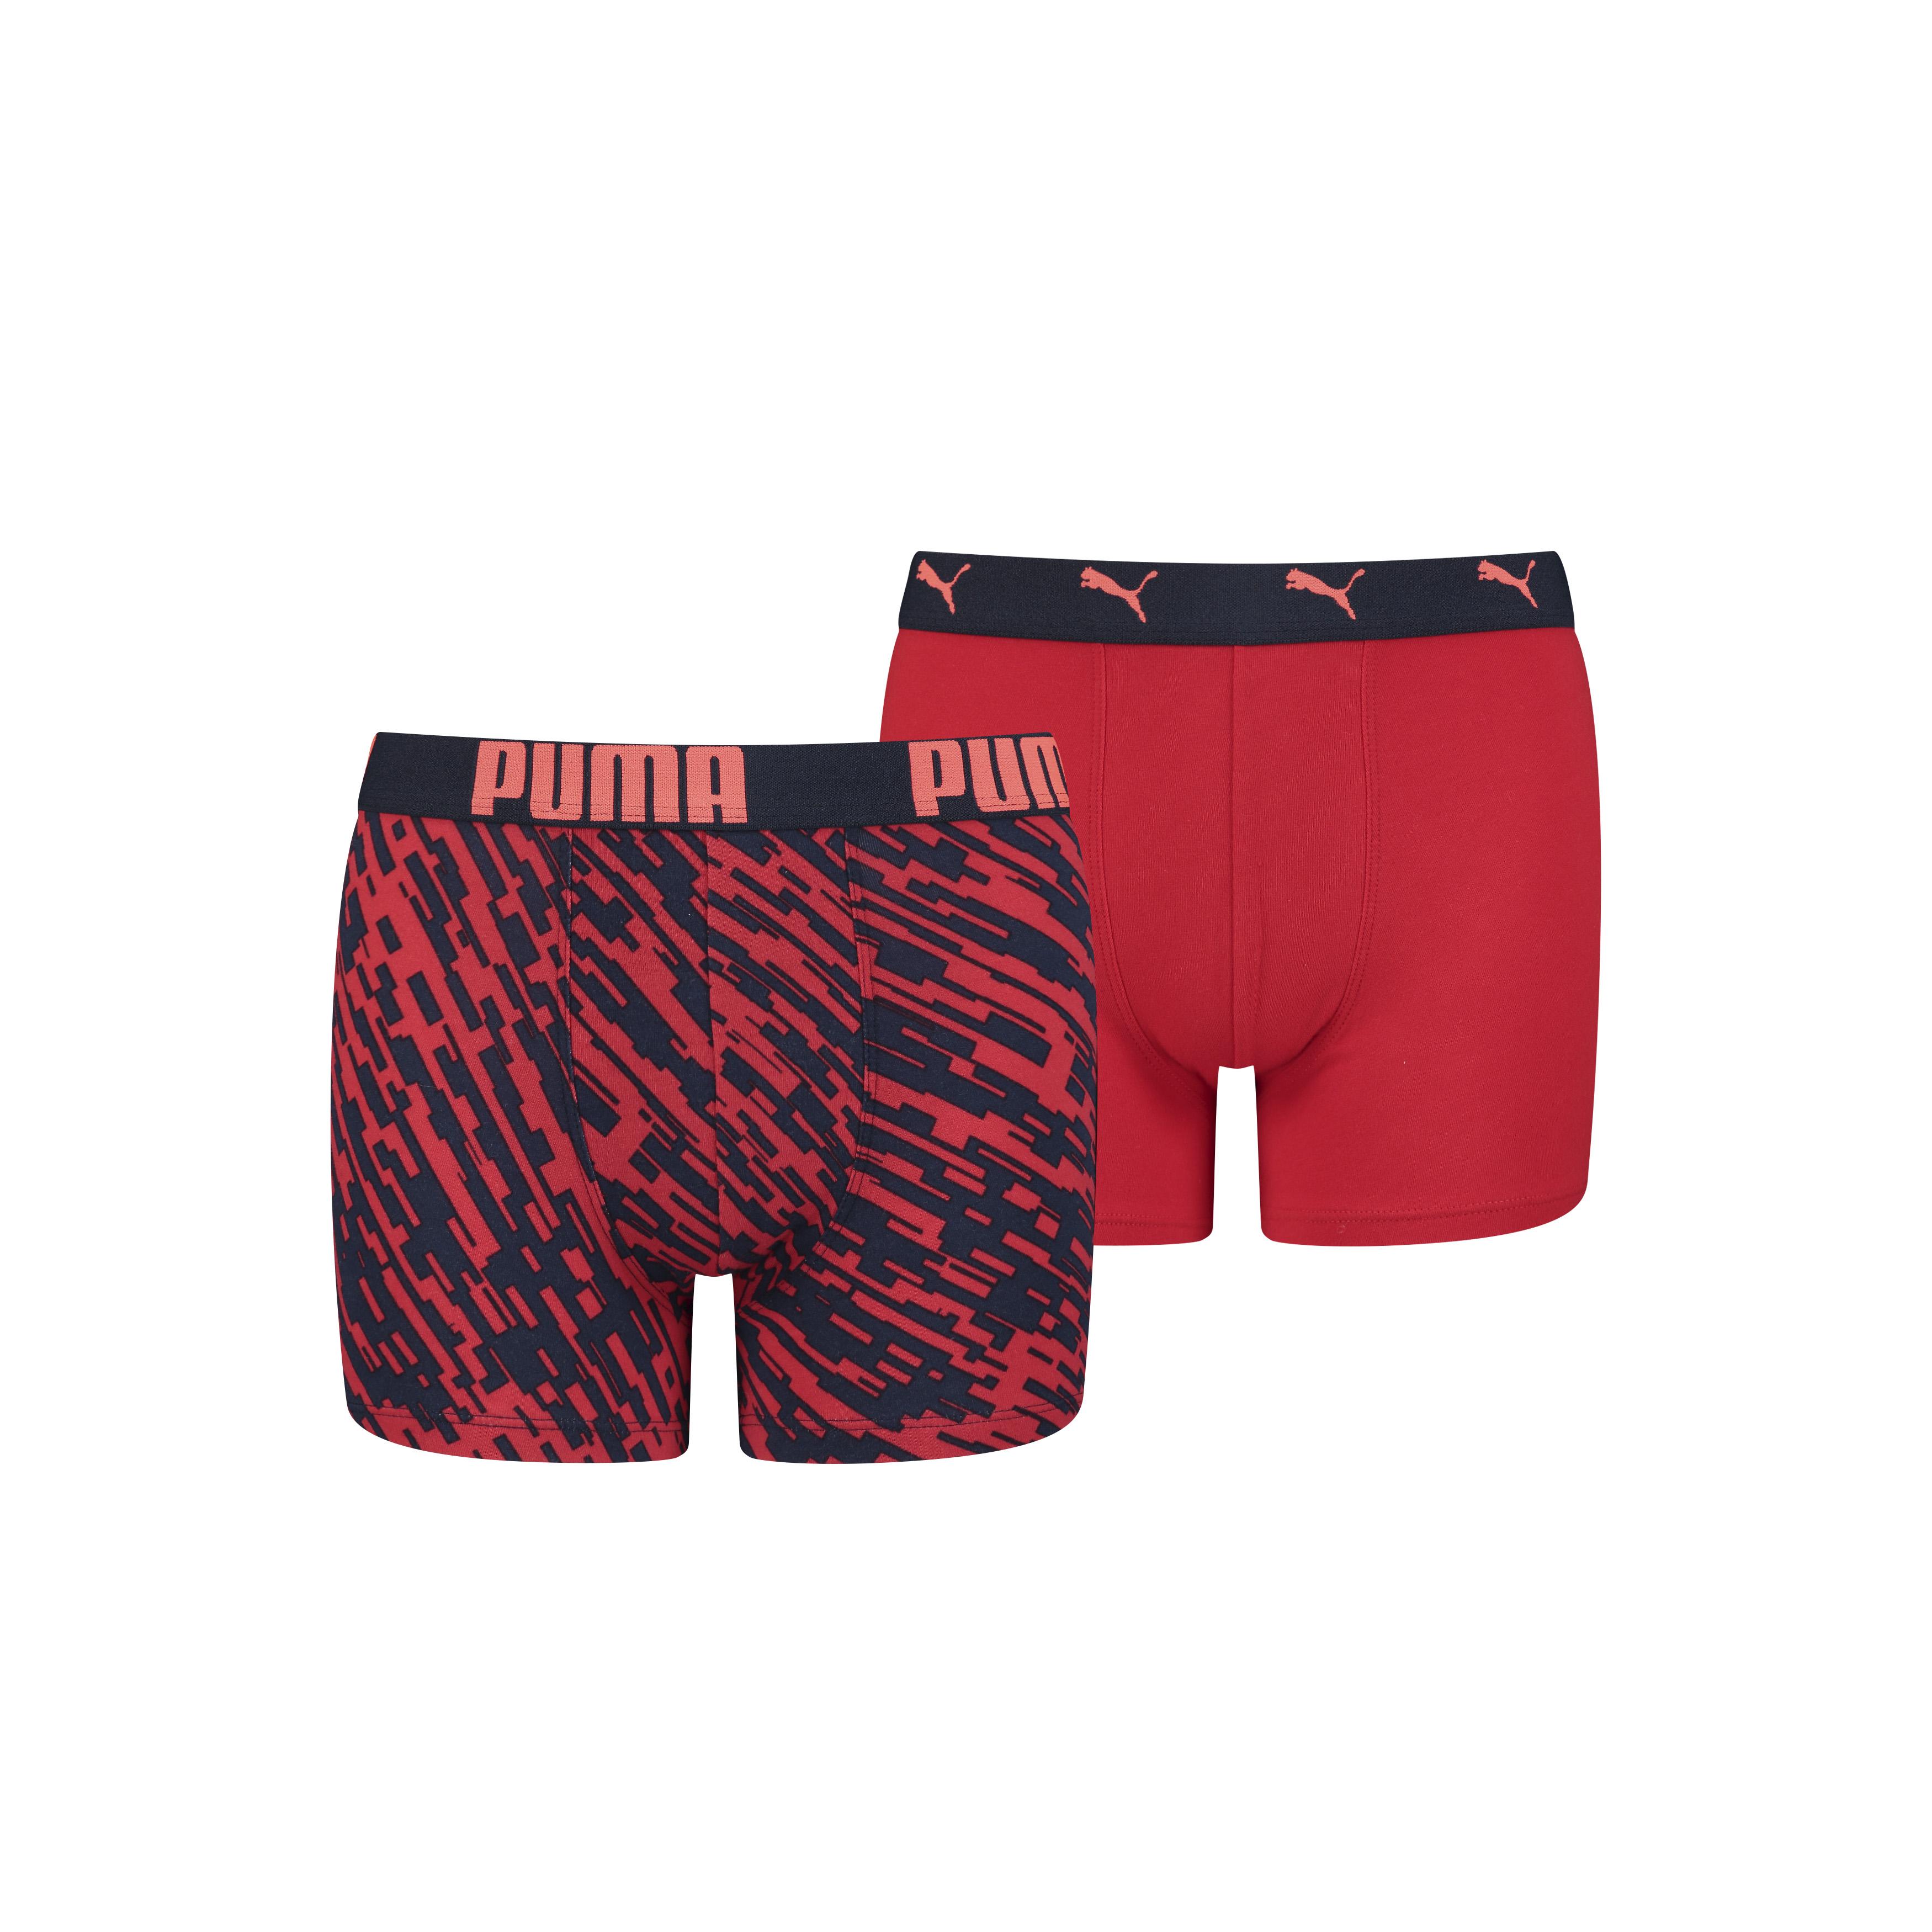 Puma Boys Print Boxershorts Navy/Red 2-pack-134-140